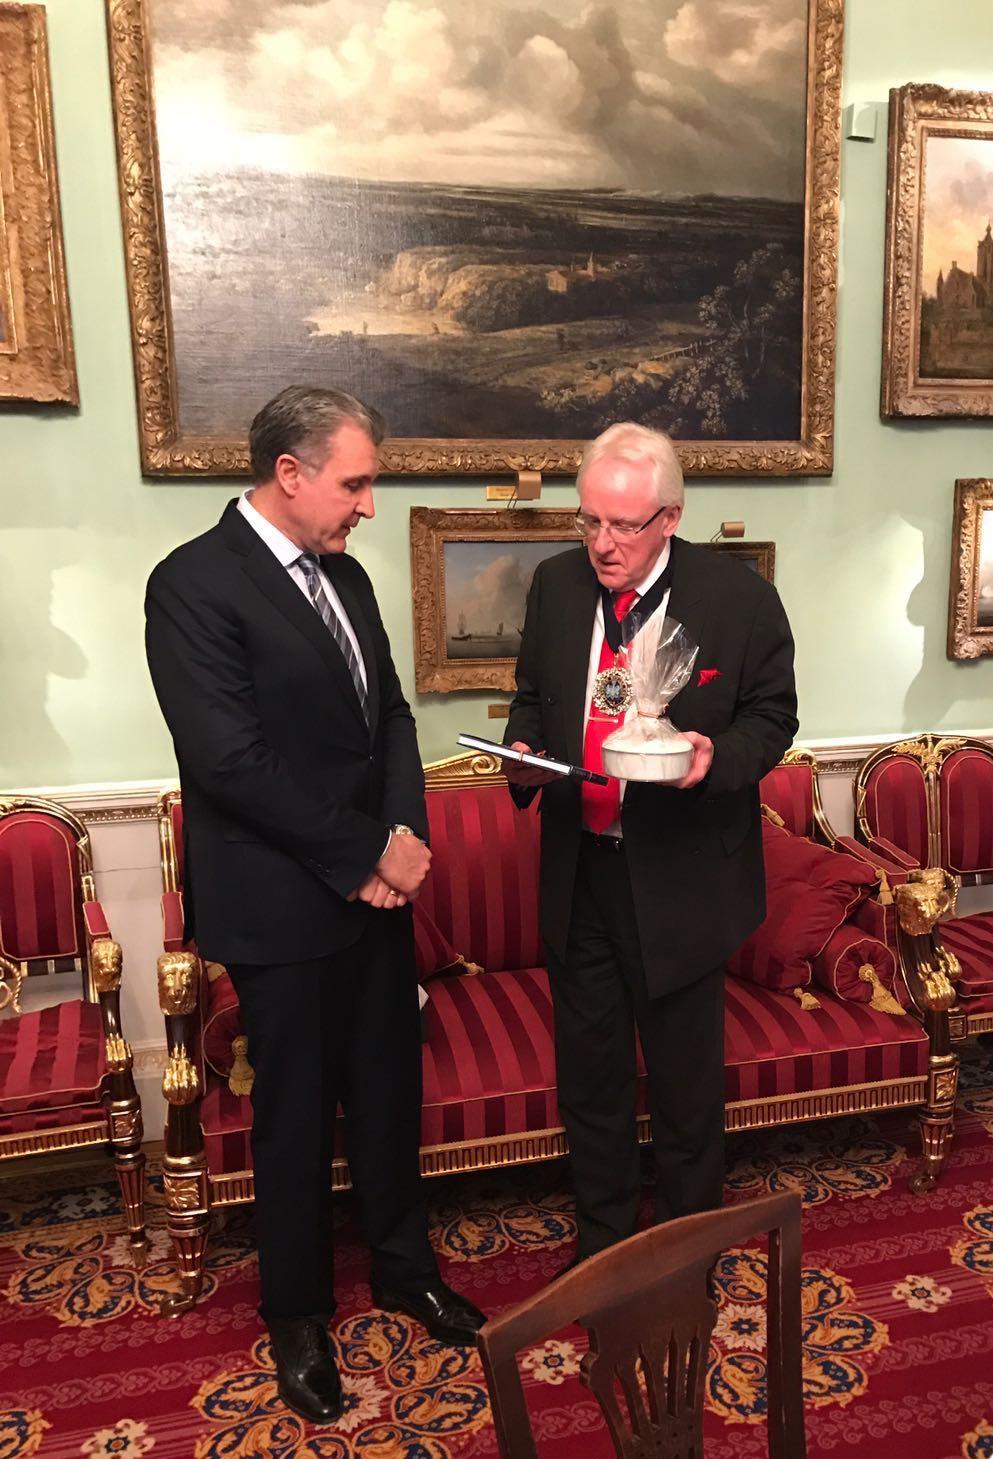 Principele Radu si Lordul Primar al Londrei, Mansion House, 7 februarie 2017, foto Leonard Chelaru-Popovici